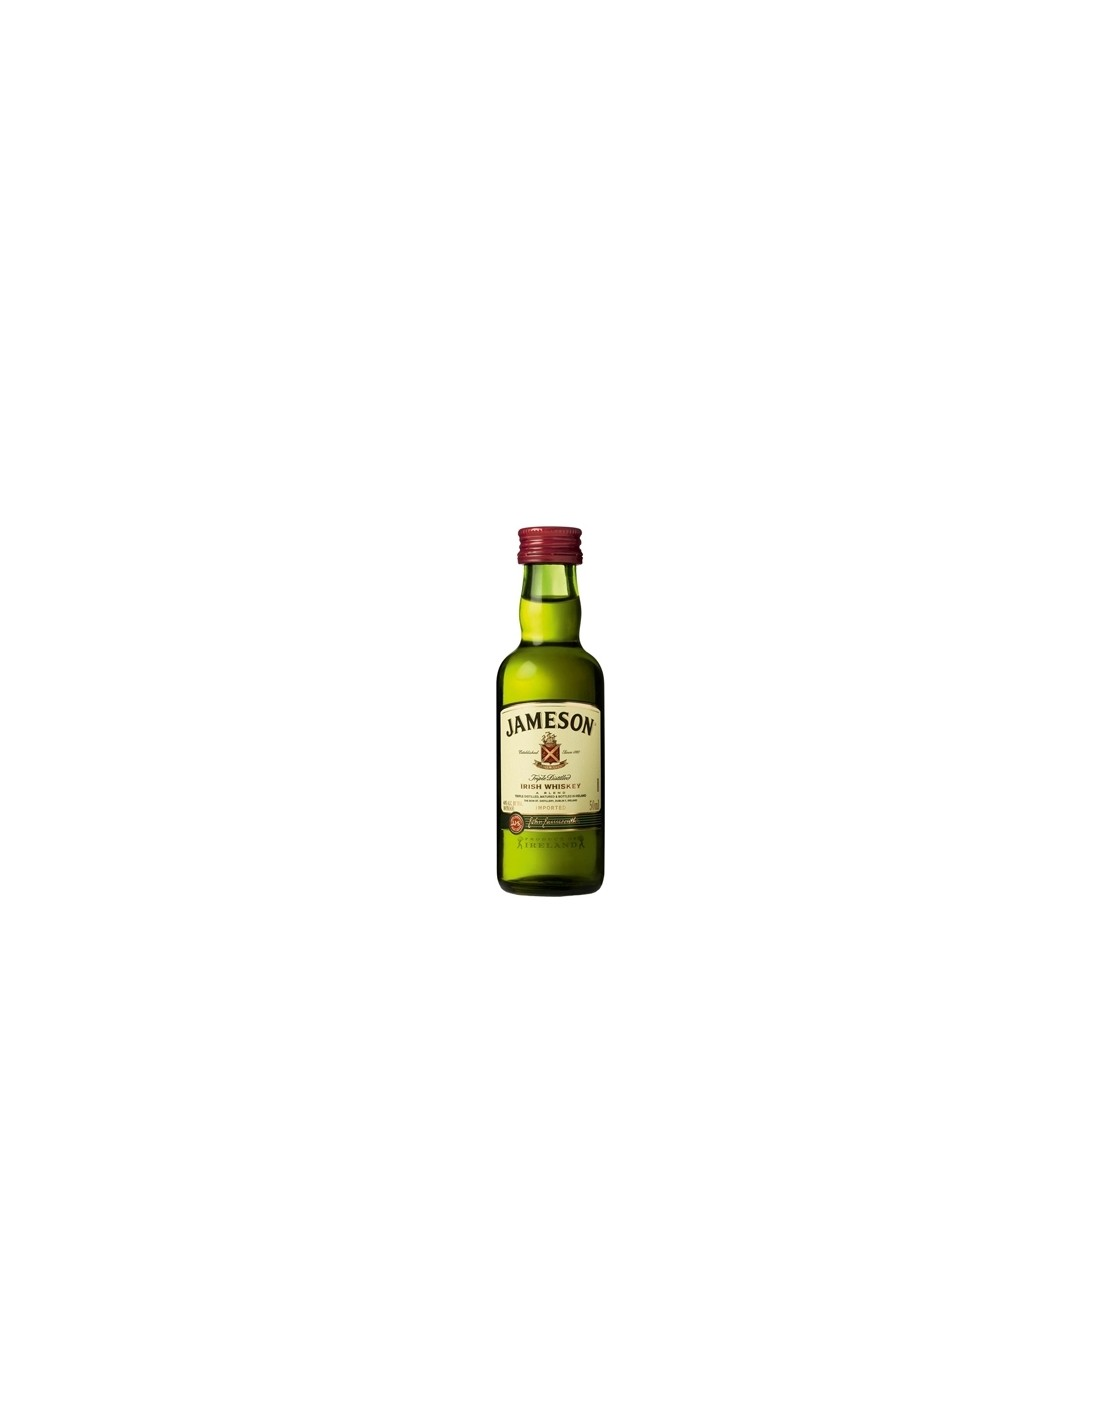 Whisky Jameson, 40% alc., 0.05L, Irlanda